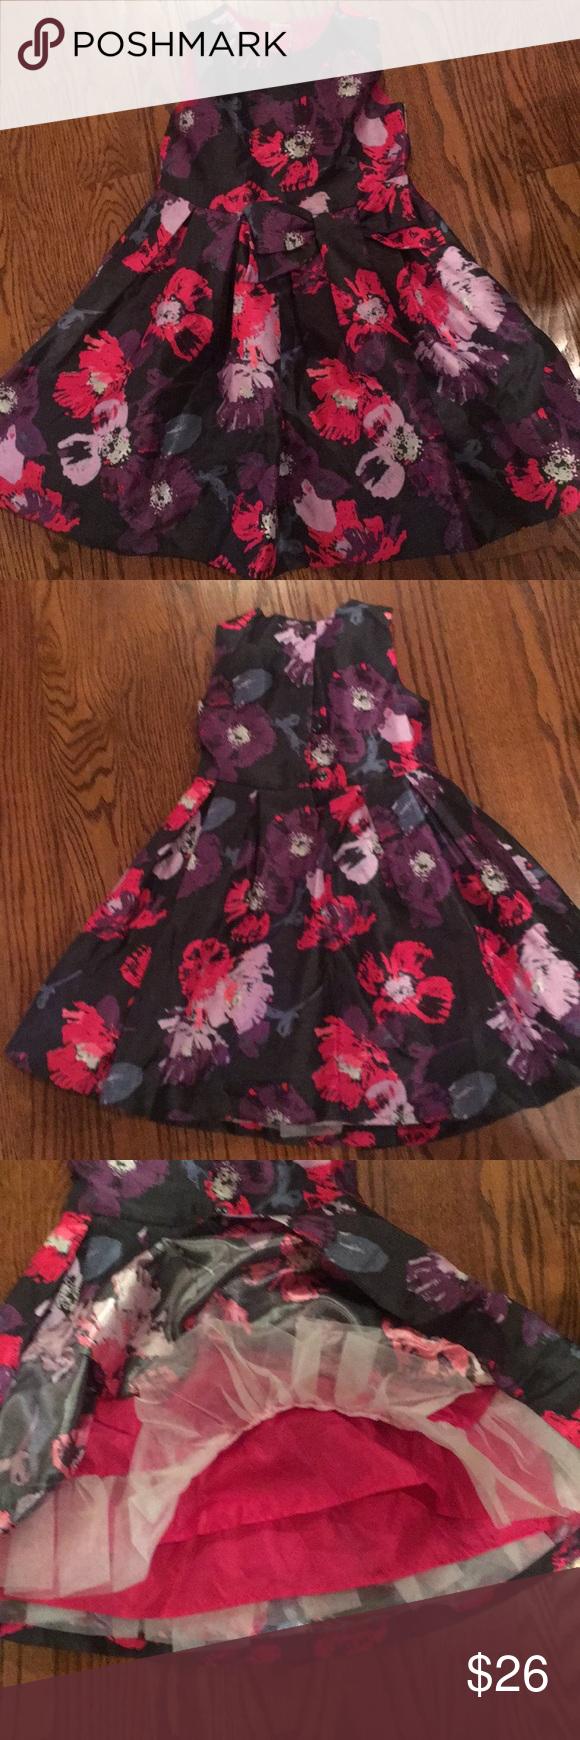 Euc Gymboree Flower Dress 4t Black Purple Pink Flower Dresses 4t Dress Dresses [ 1740 x 580 Pixel ]